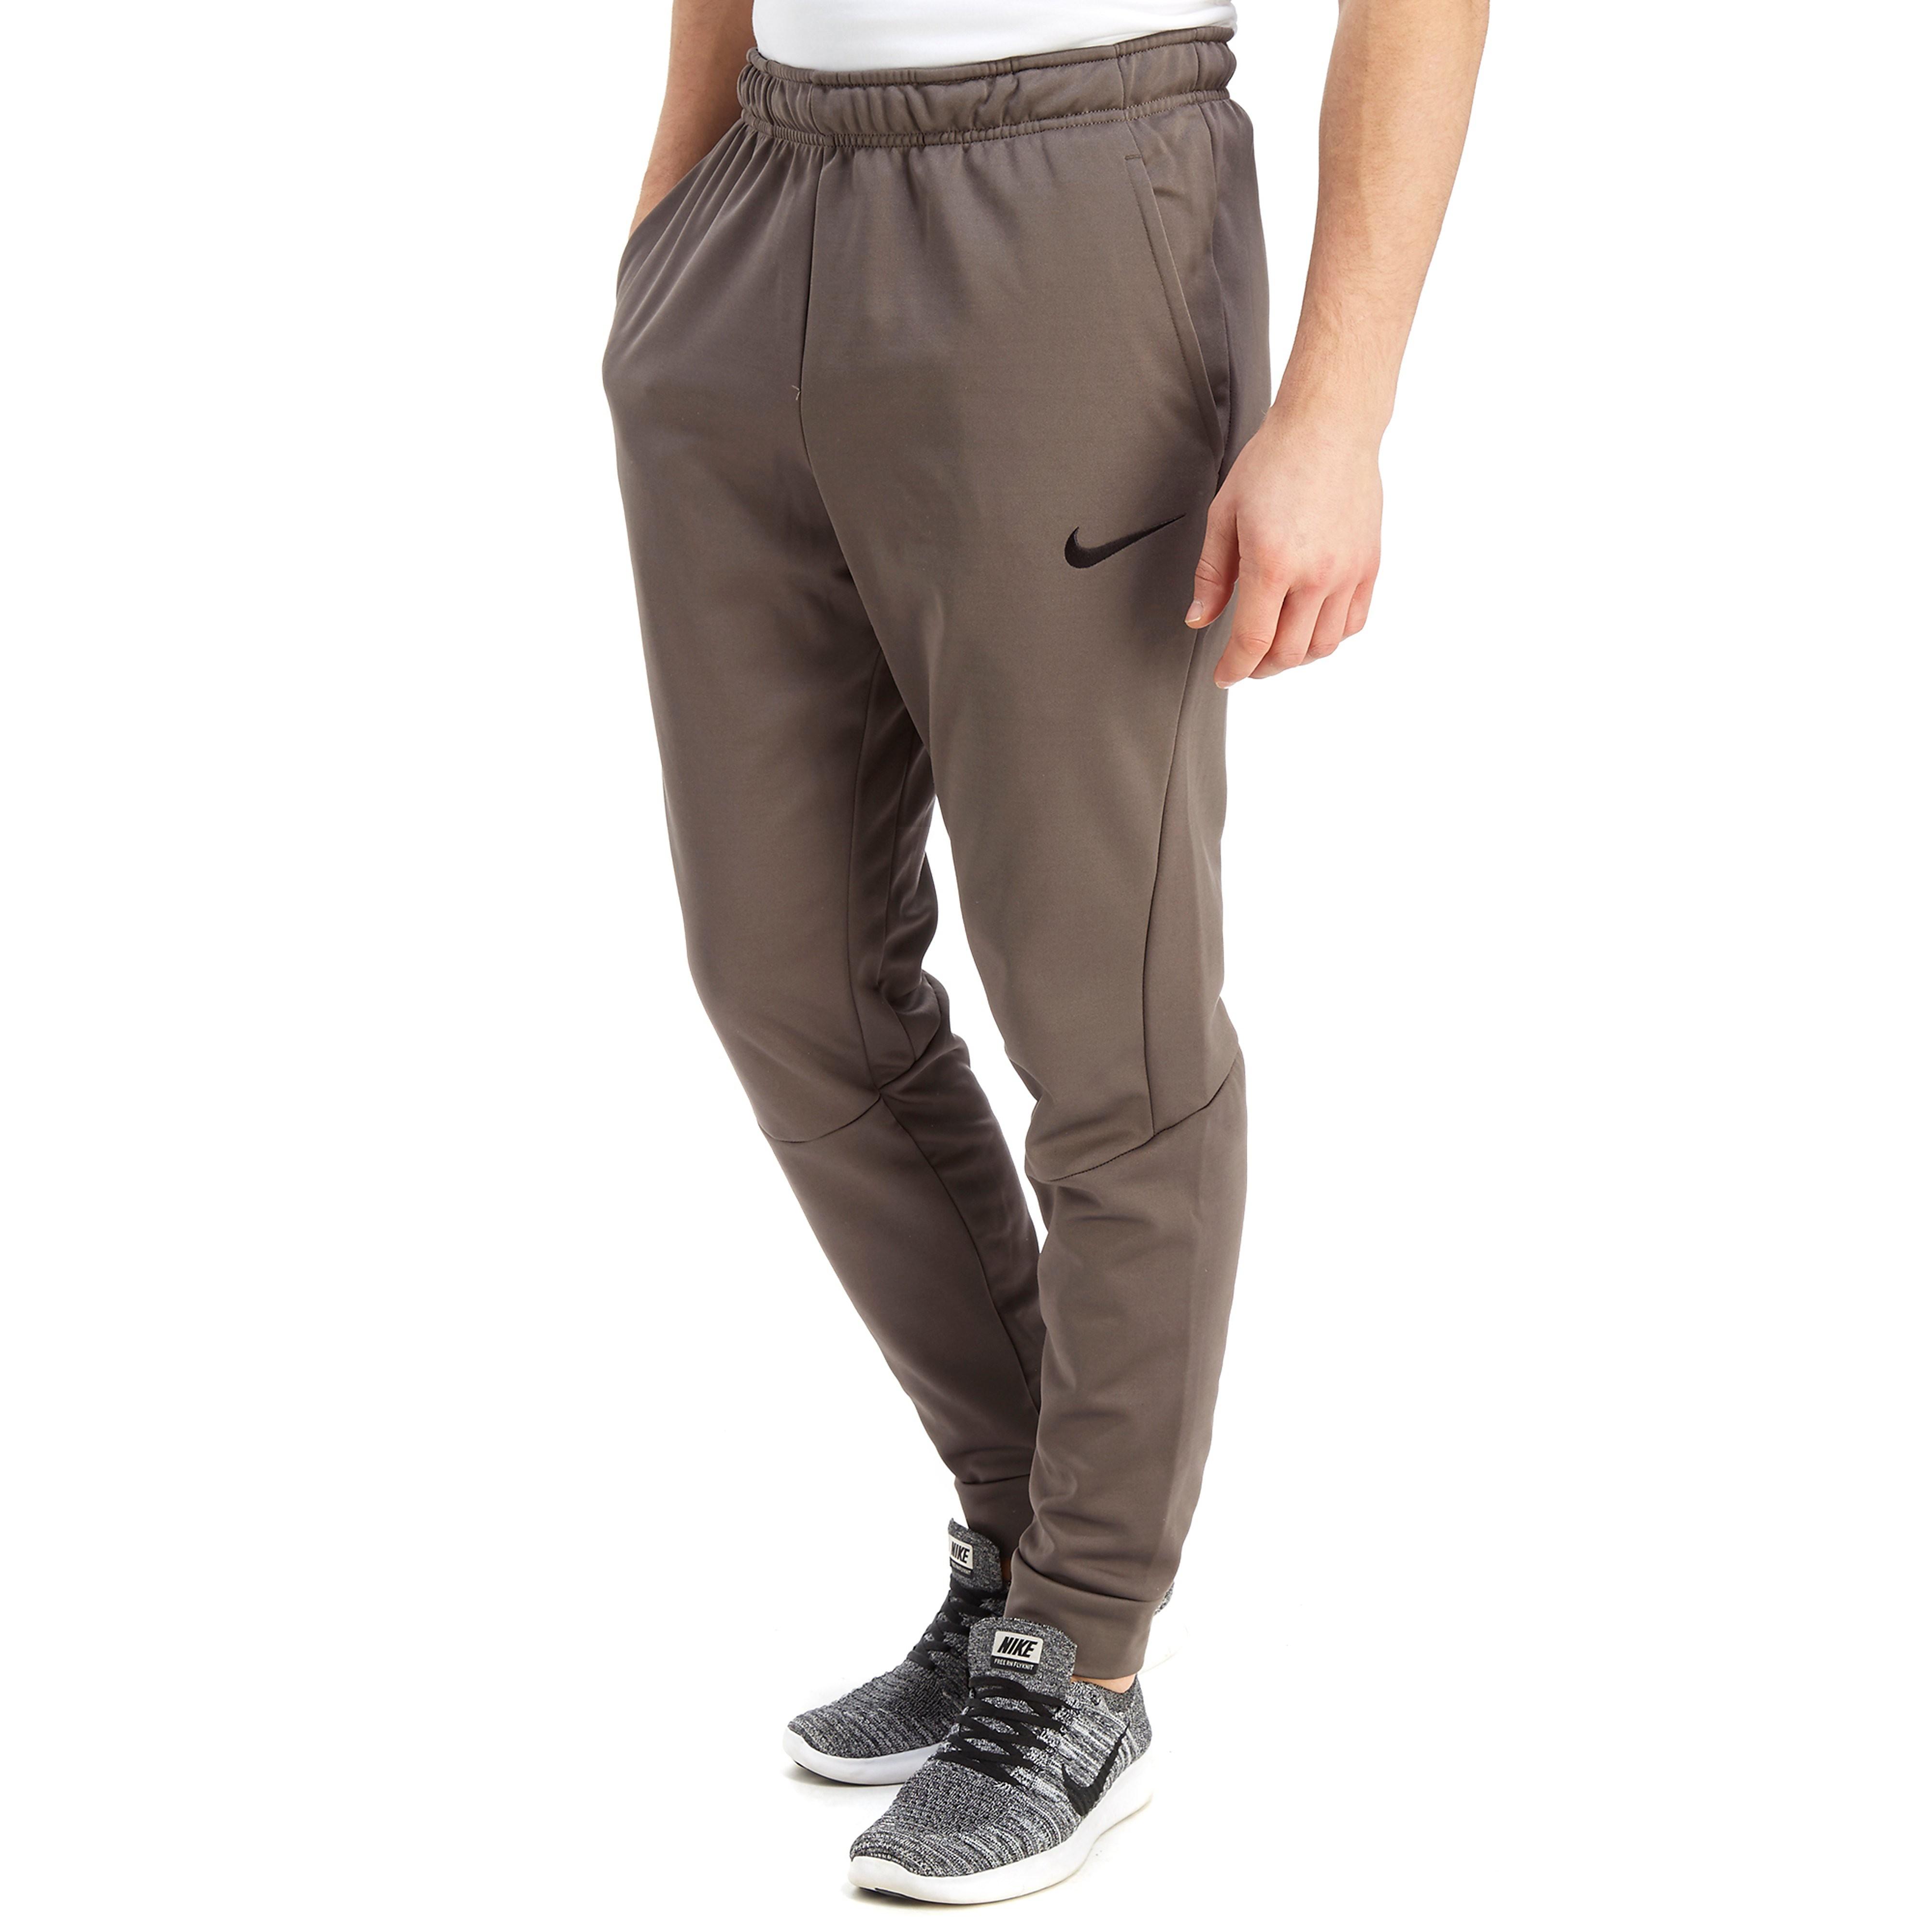 Nike Poly Men's Training Pants